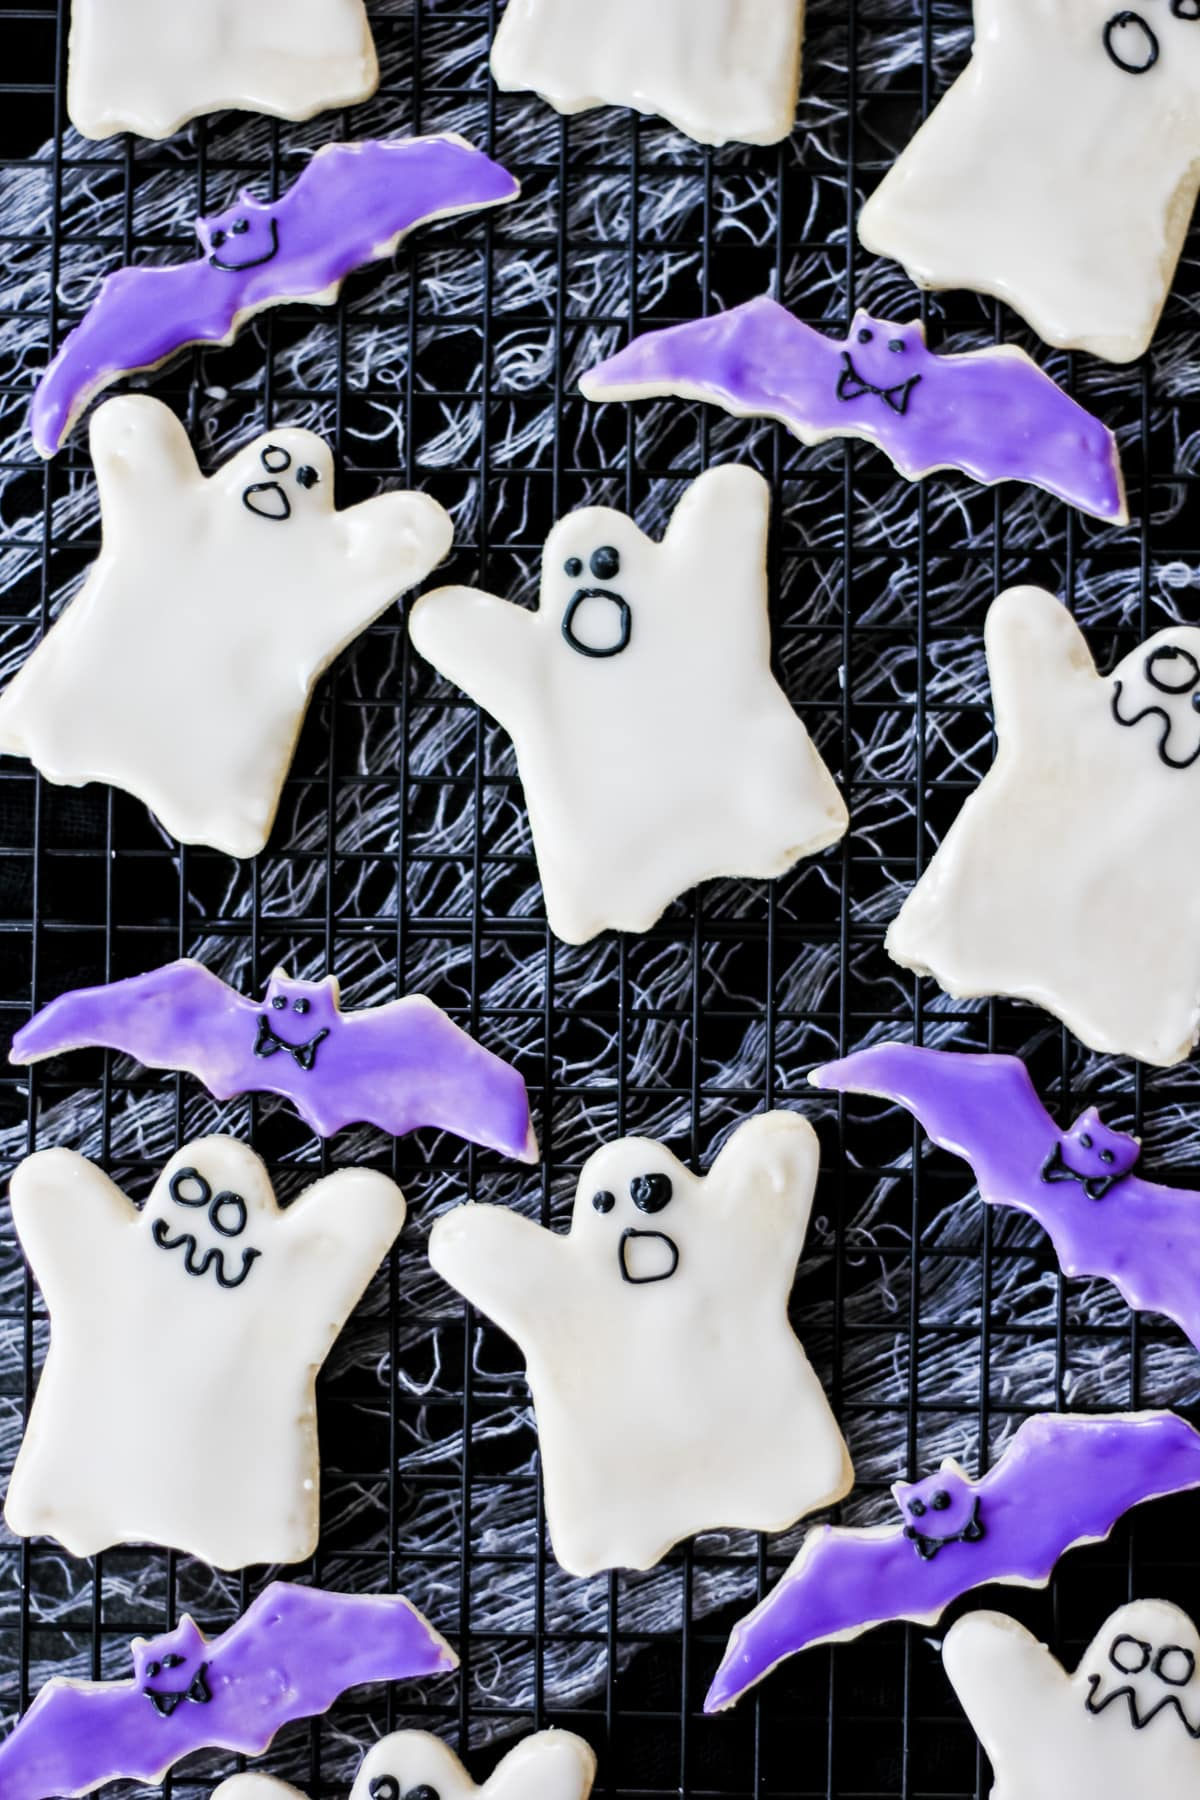 Decorated Halloween Sugar Cookies!